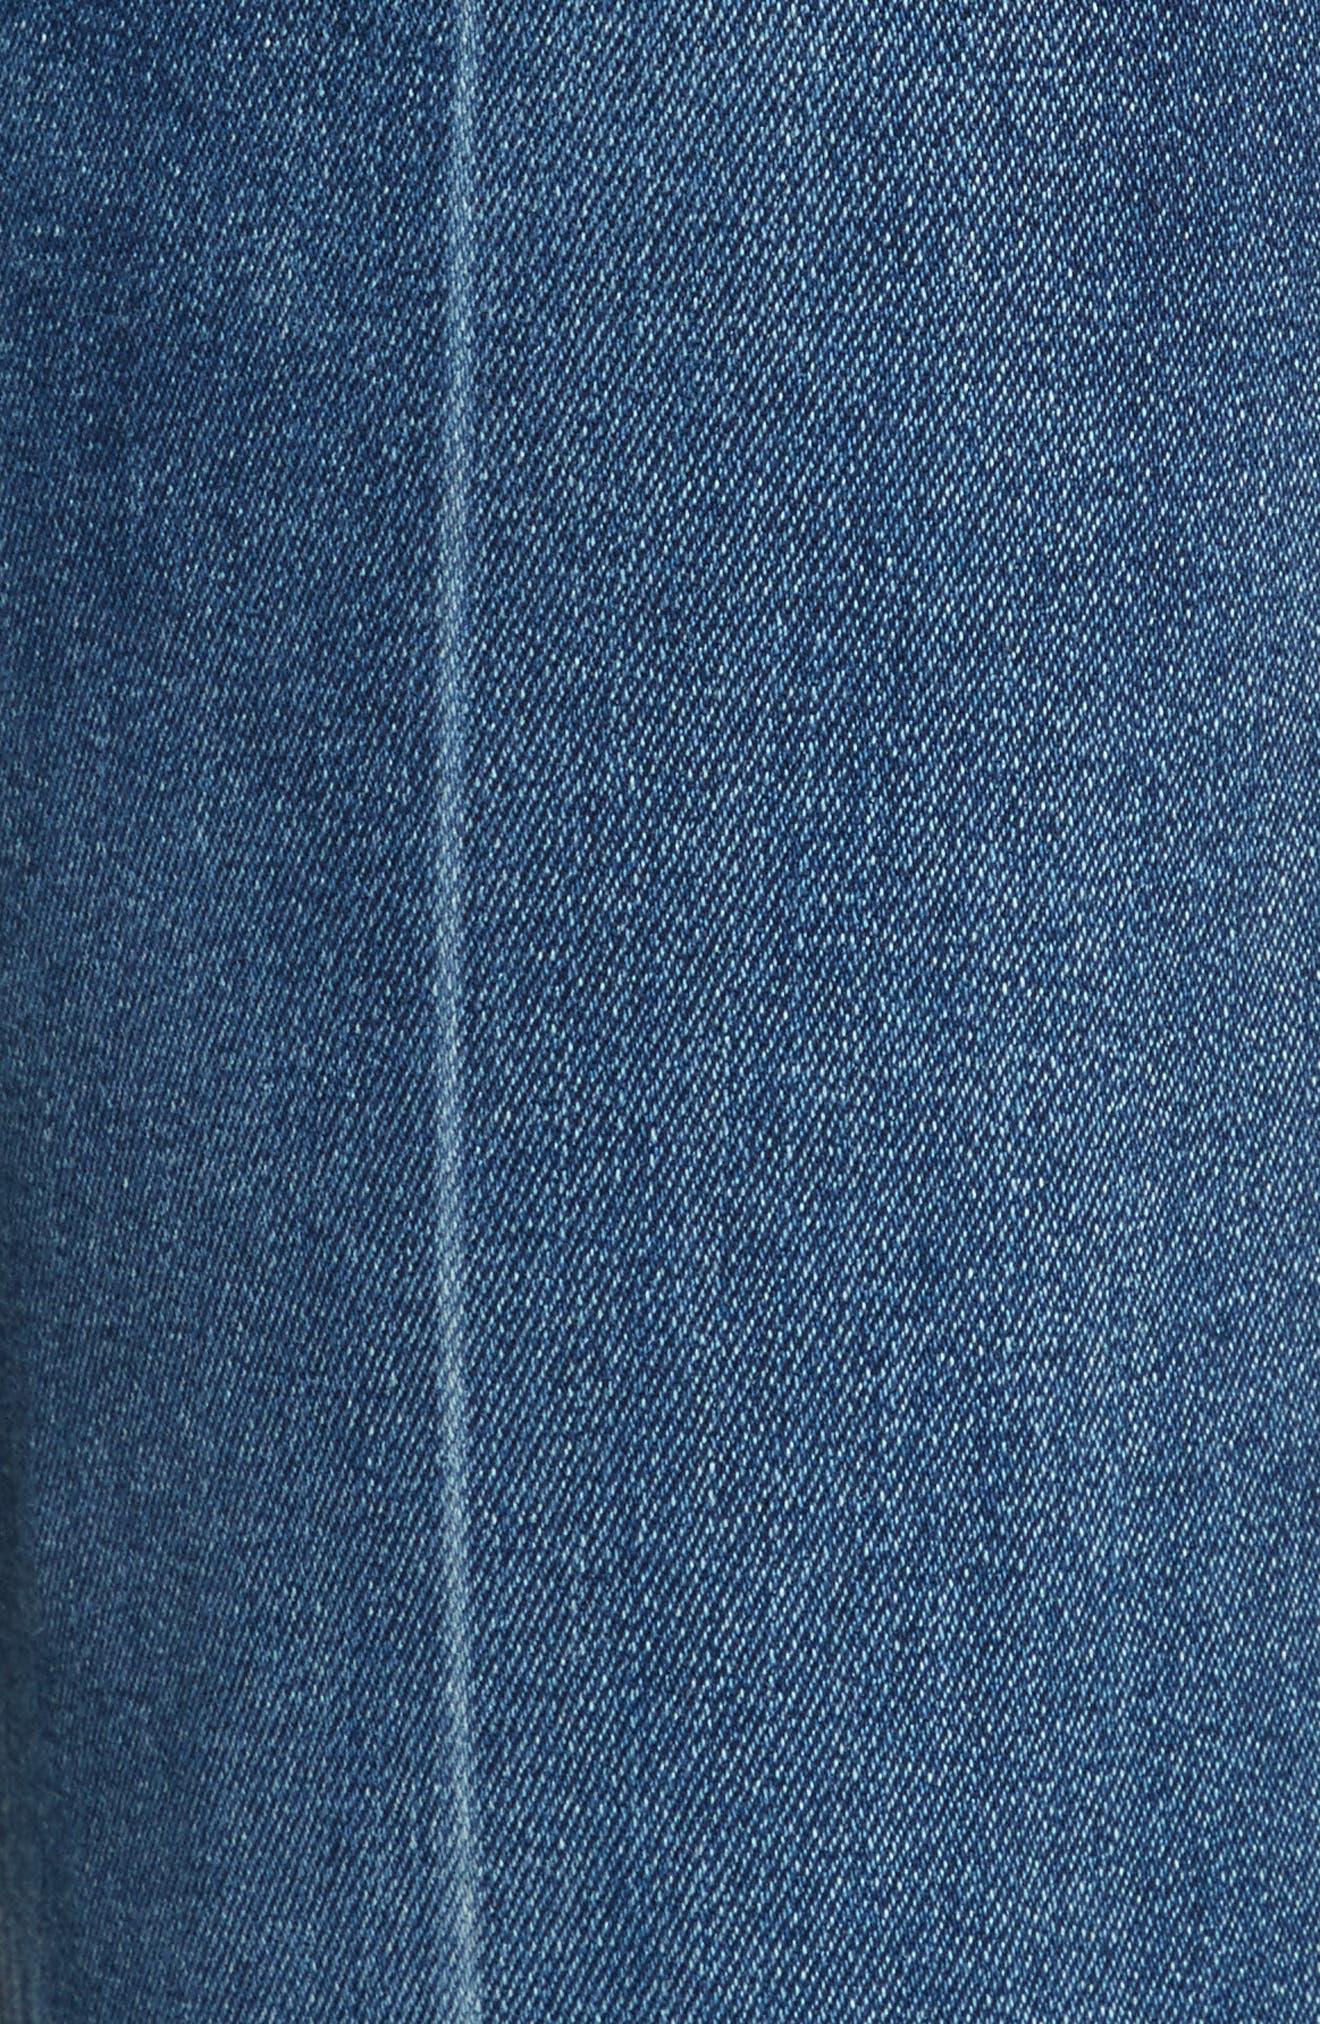 Justine High Waist Trouser Jeans,                             Alternate thumbnail 5, color,                             462